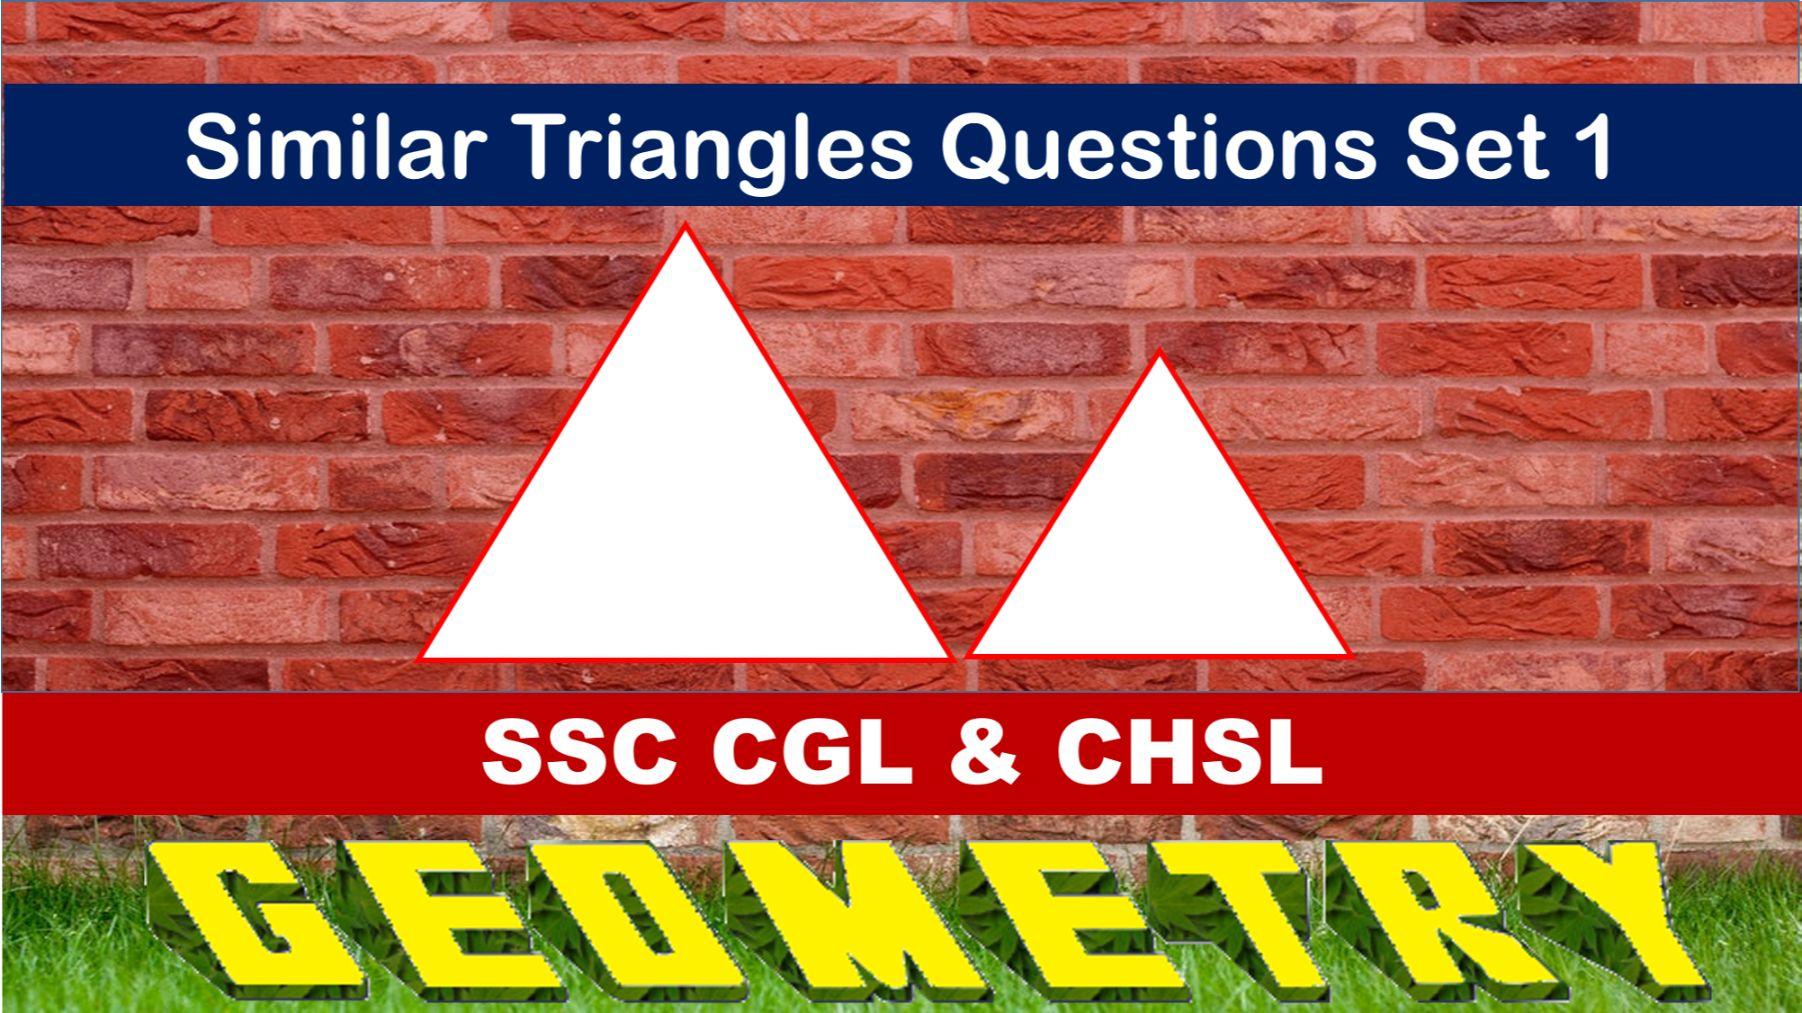 SSC CGL Geometry Similar Triangles Set 1